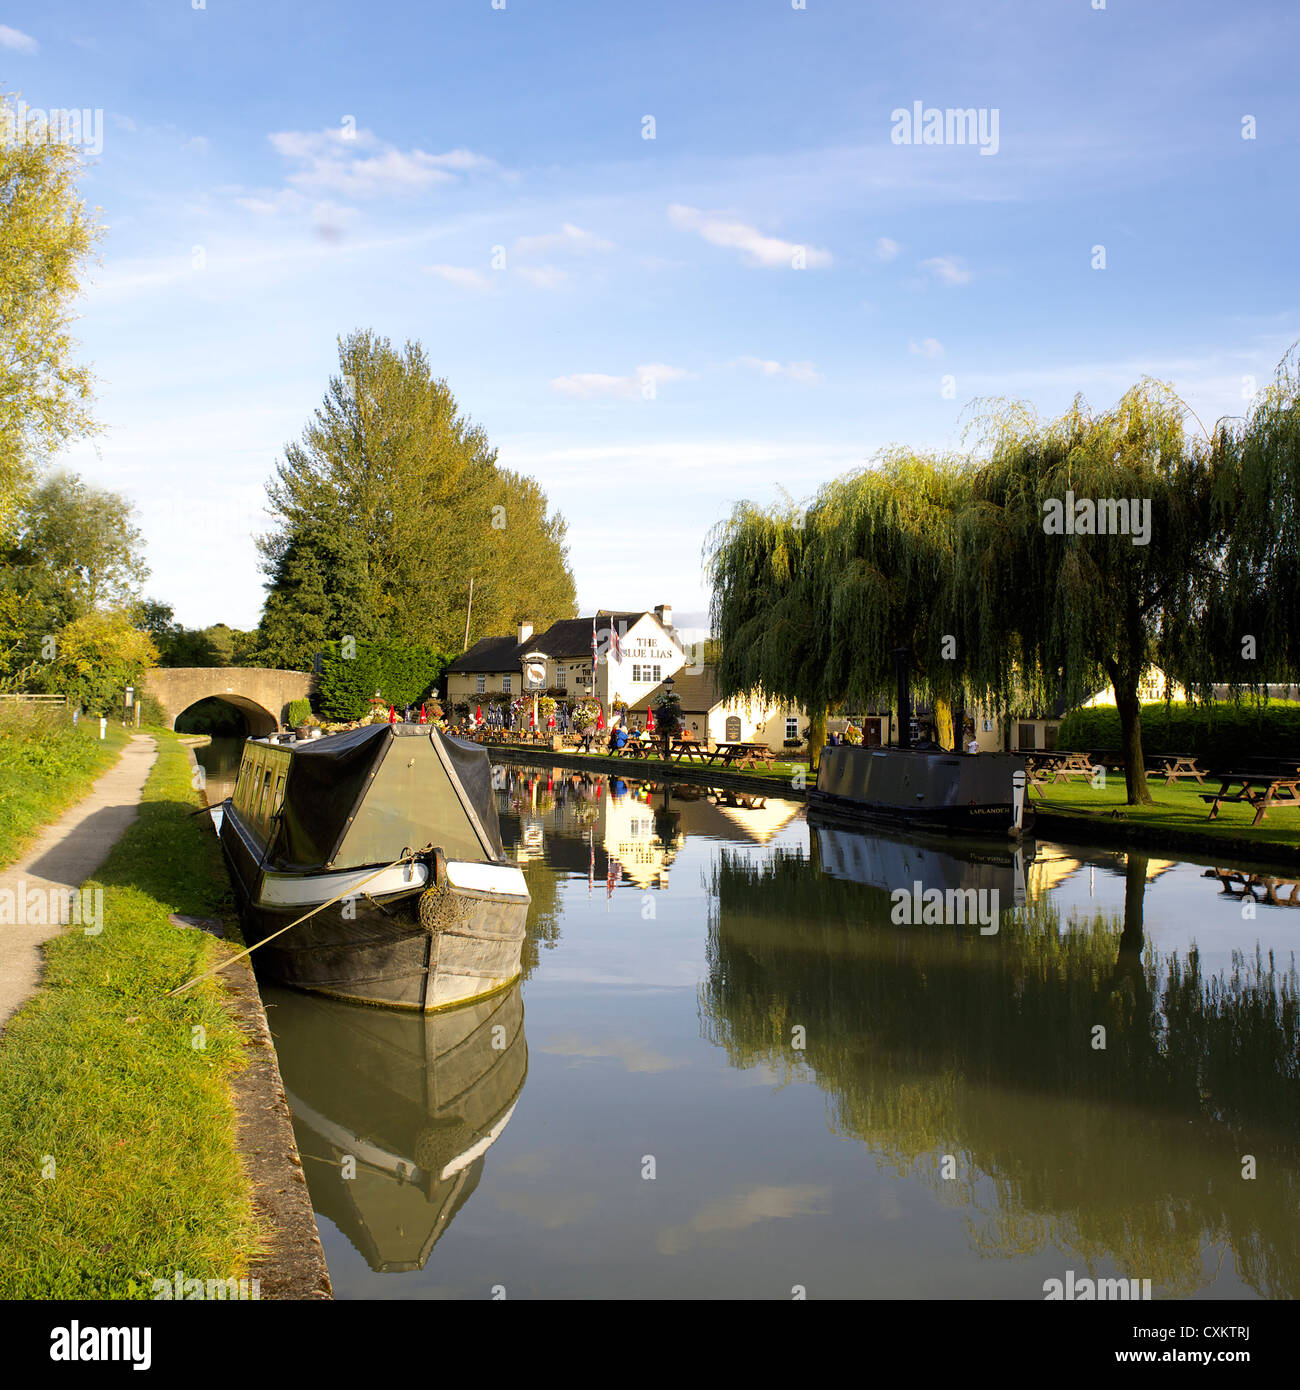 The Blue Lias Inn, Grand Union Canal, Warwickshire, UK, England, GB, British, English, country, pubs, pub, inland, - Stock Image